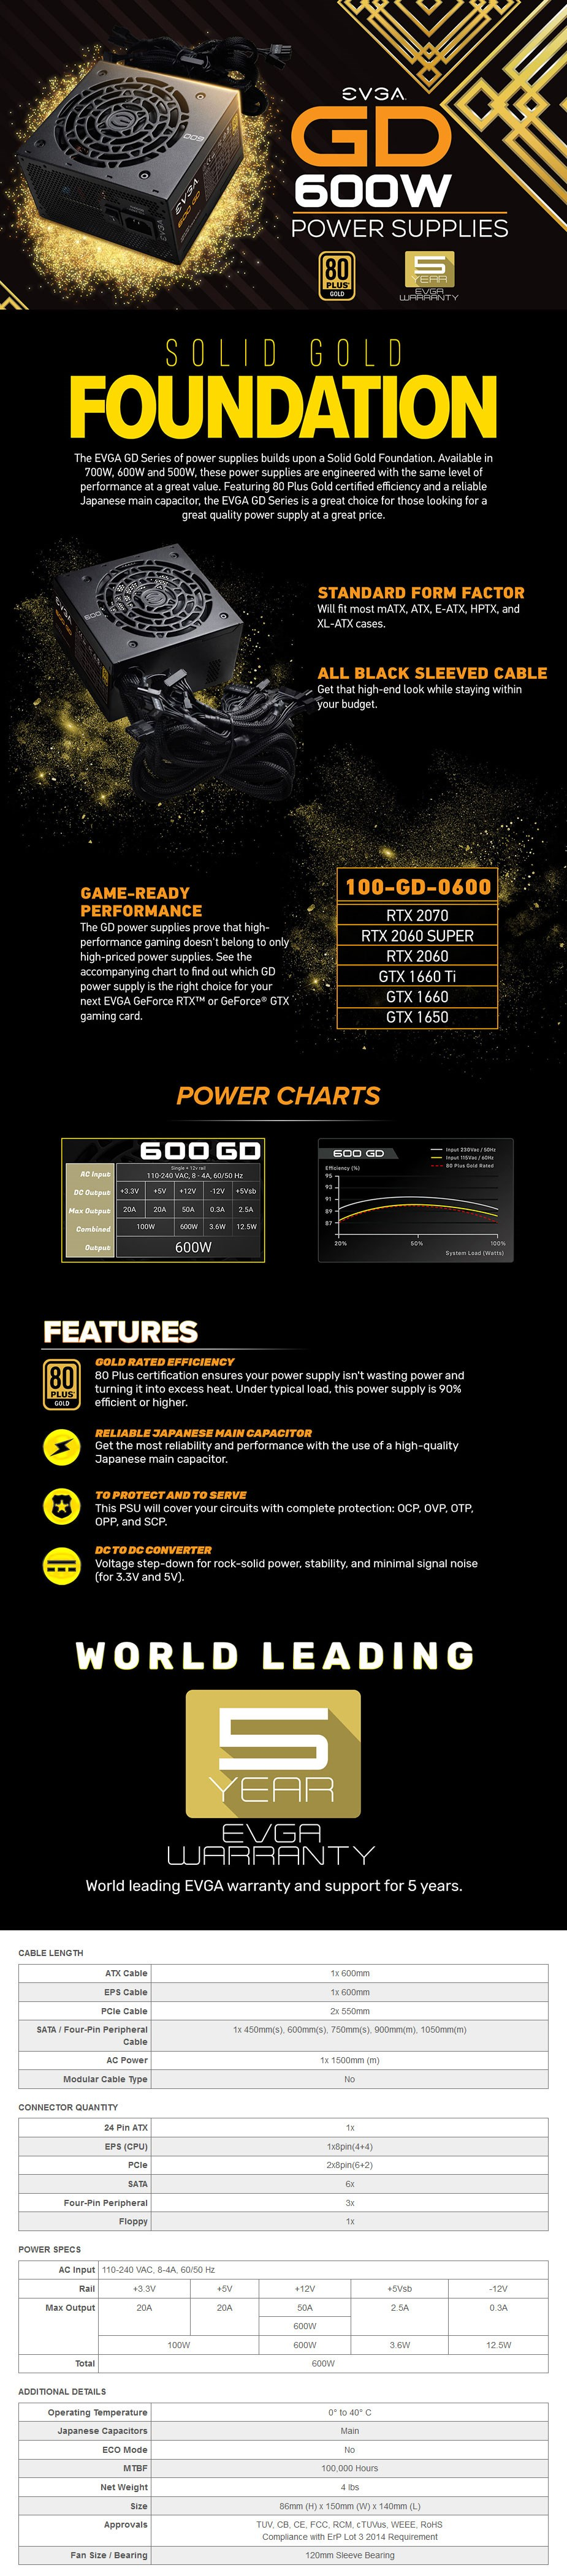 evga-600-gd-600w-80-gold-nonmodular-power-supply-ac32525-6.jpg